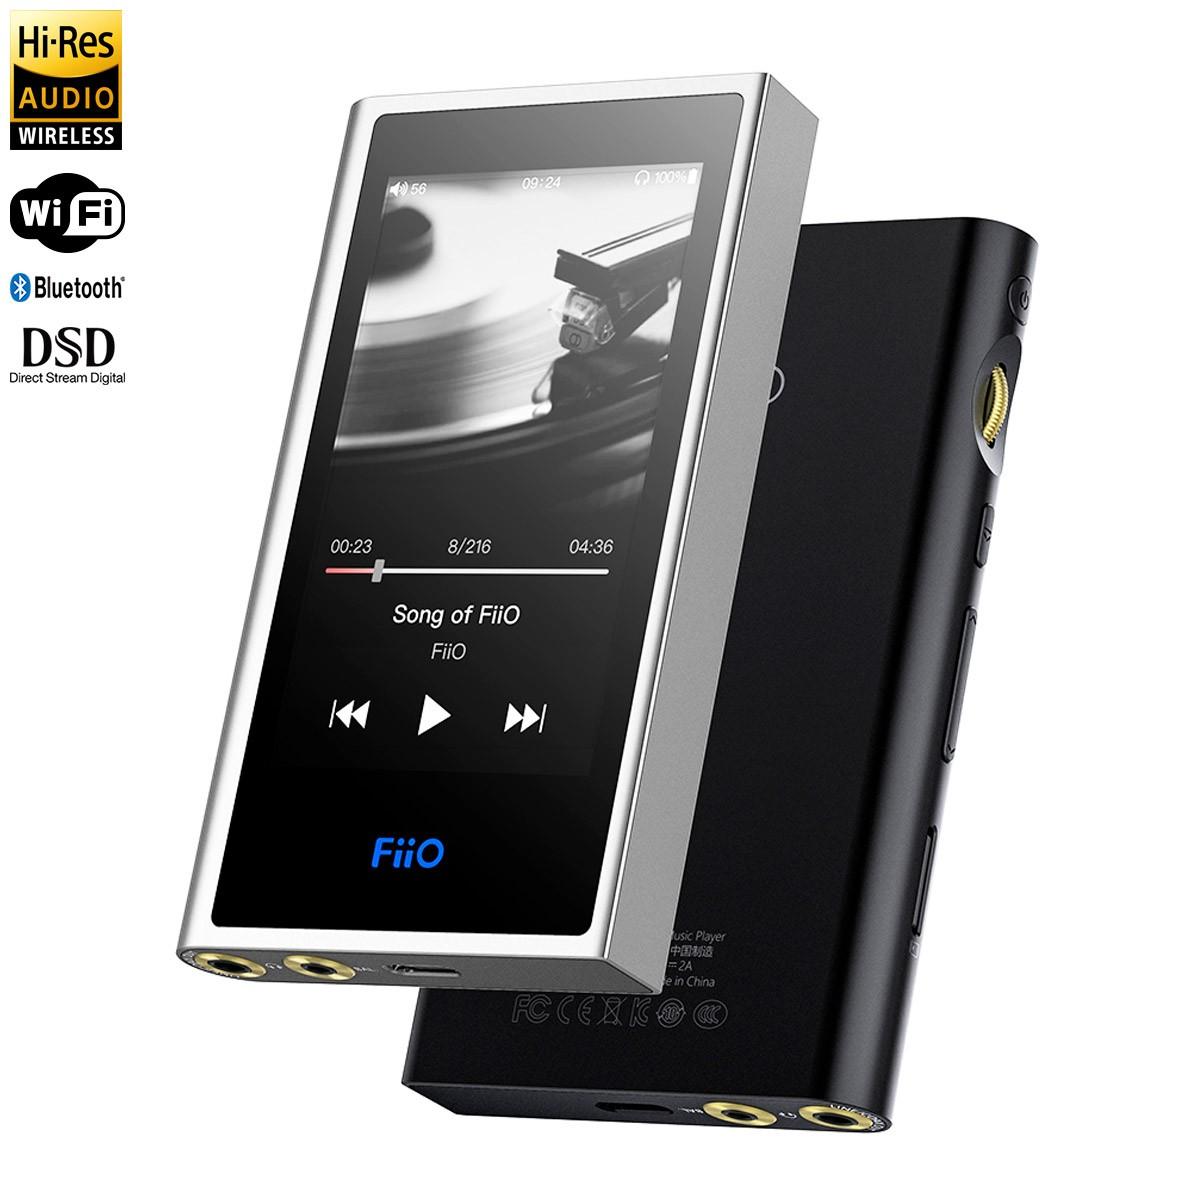 FIIO M9 Digital Audio Player DAP 2x AK4490EN WiFi Bluetooth aptX-HD LDAC HWA Balanced 32bit 192kHz DSD128 Black